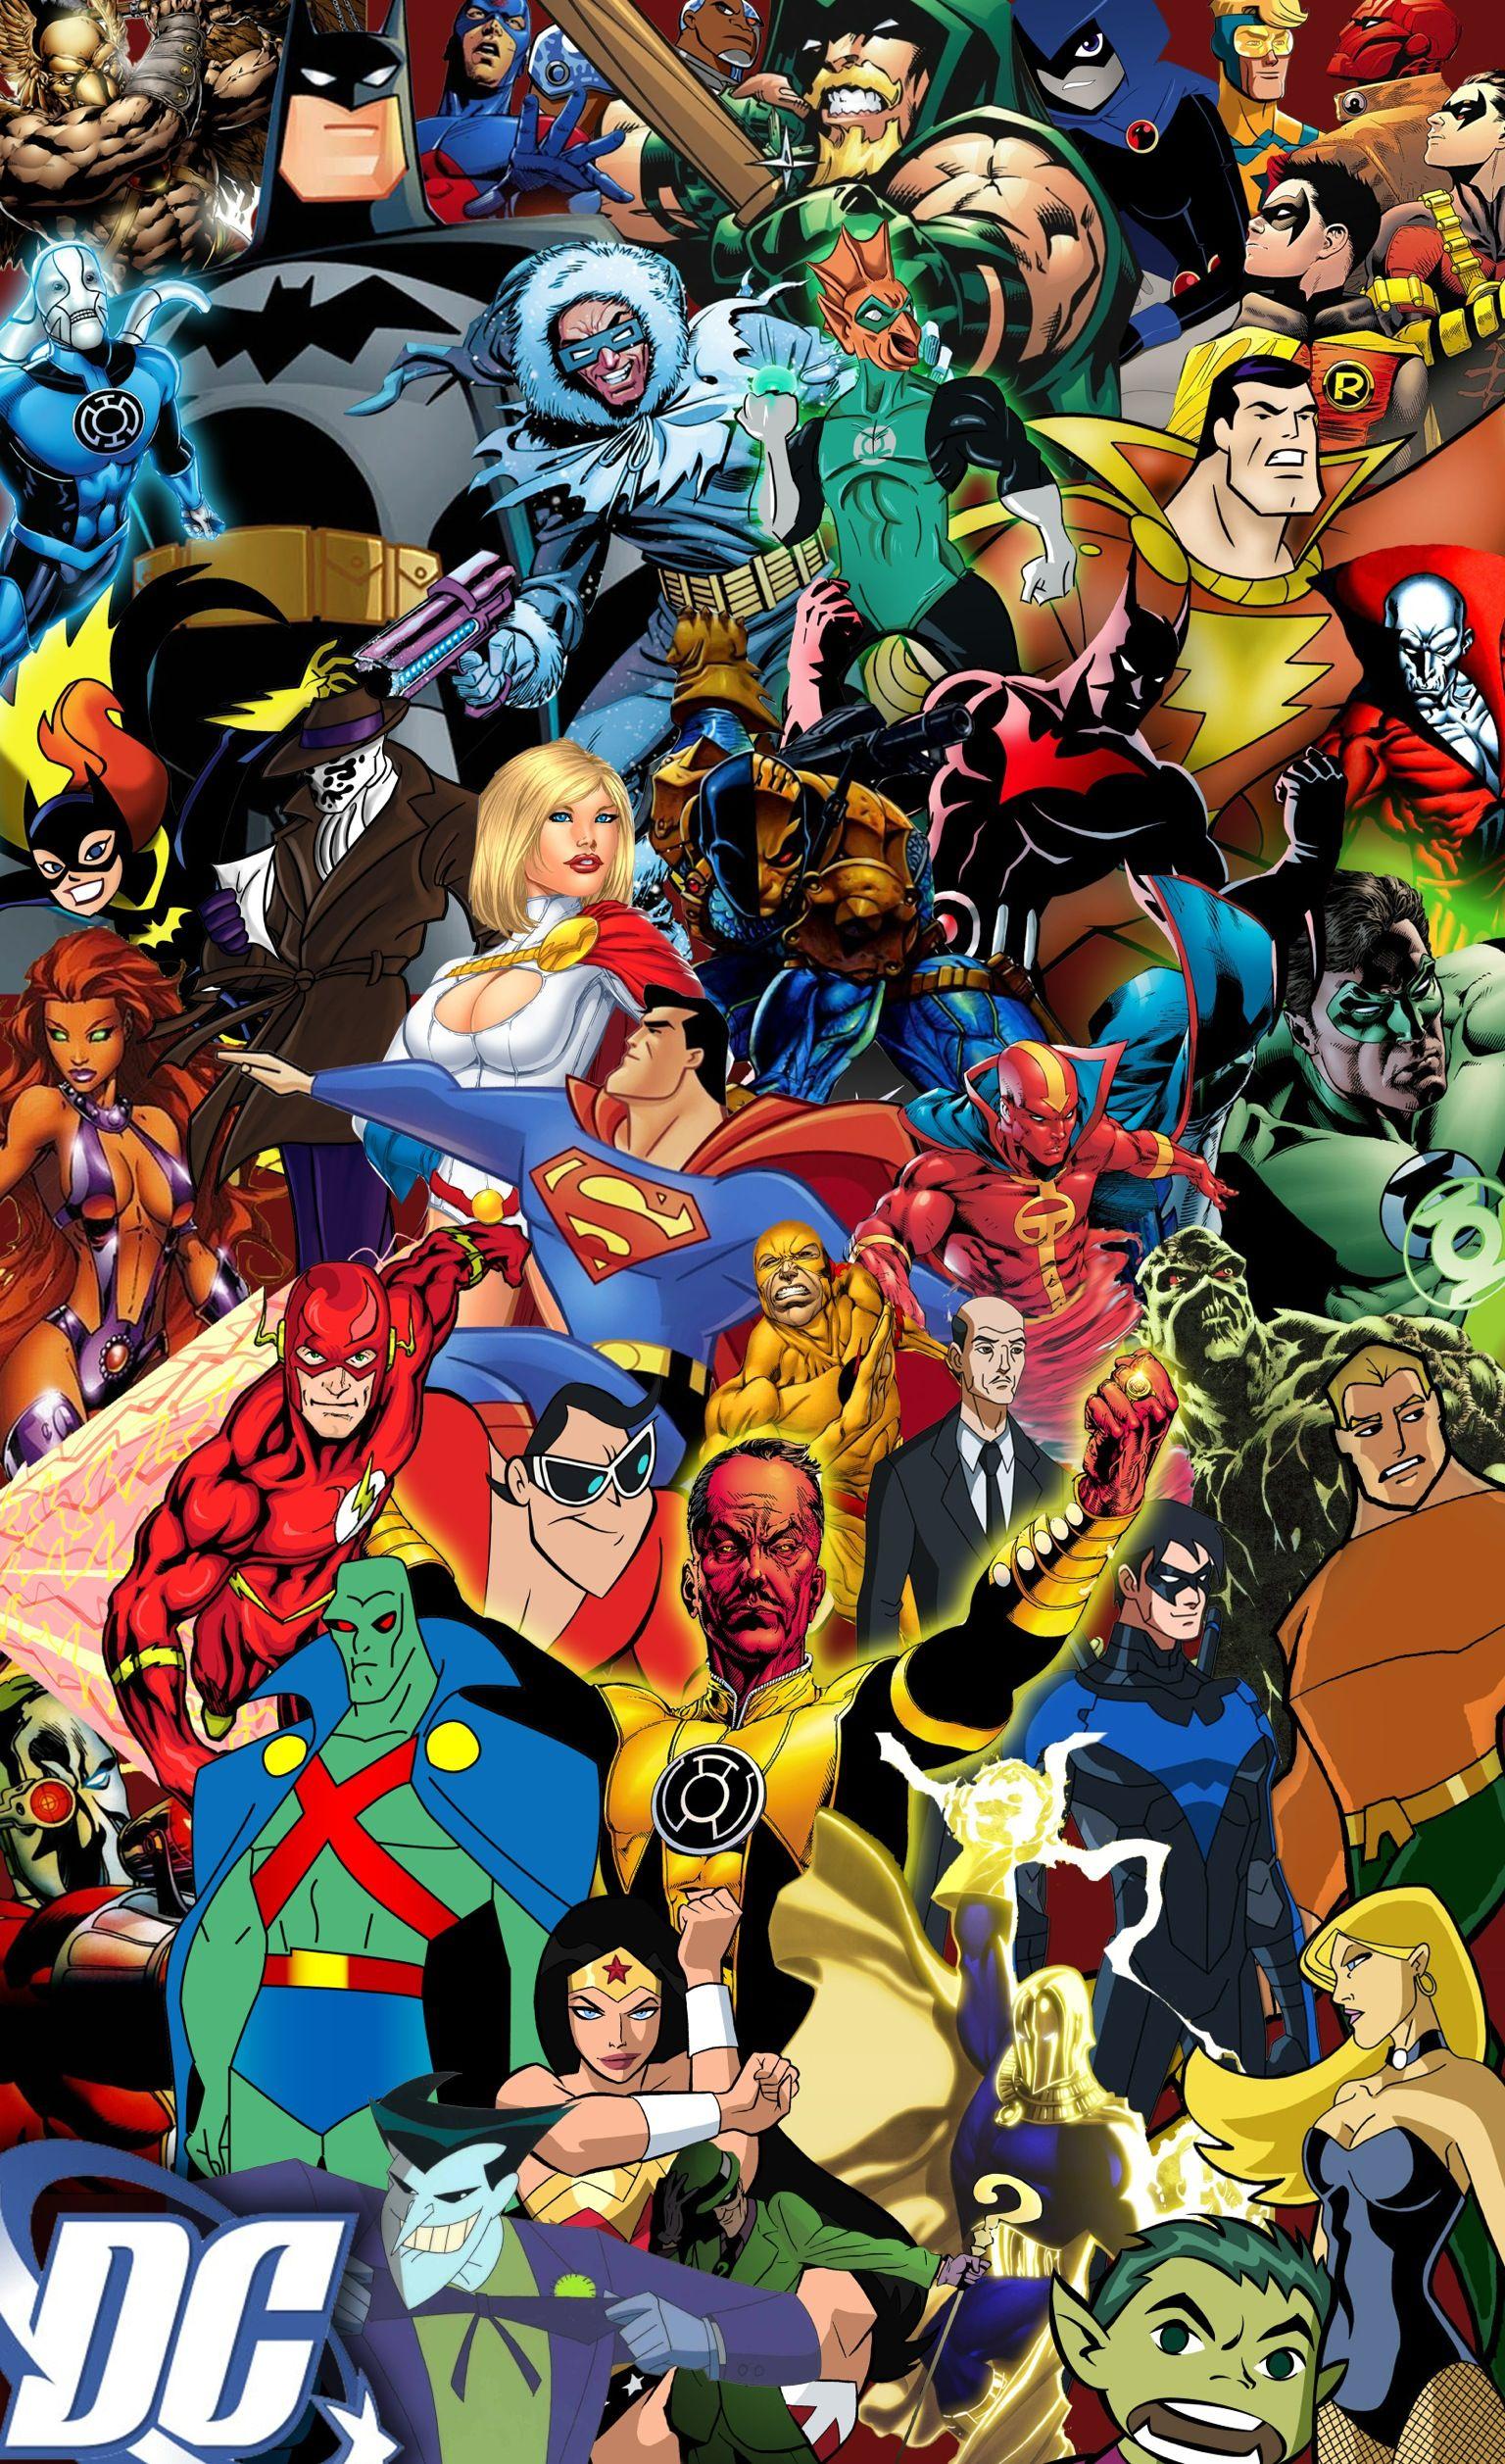 Strip junaci - Page 2 C0ea6db2b86c69a6b1f2f14eb6c7f4a4